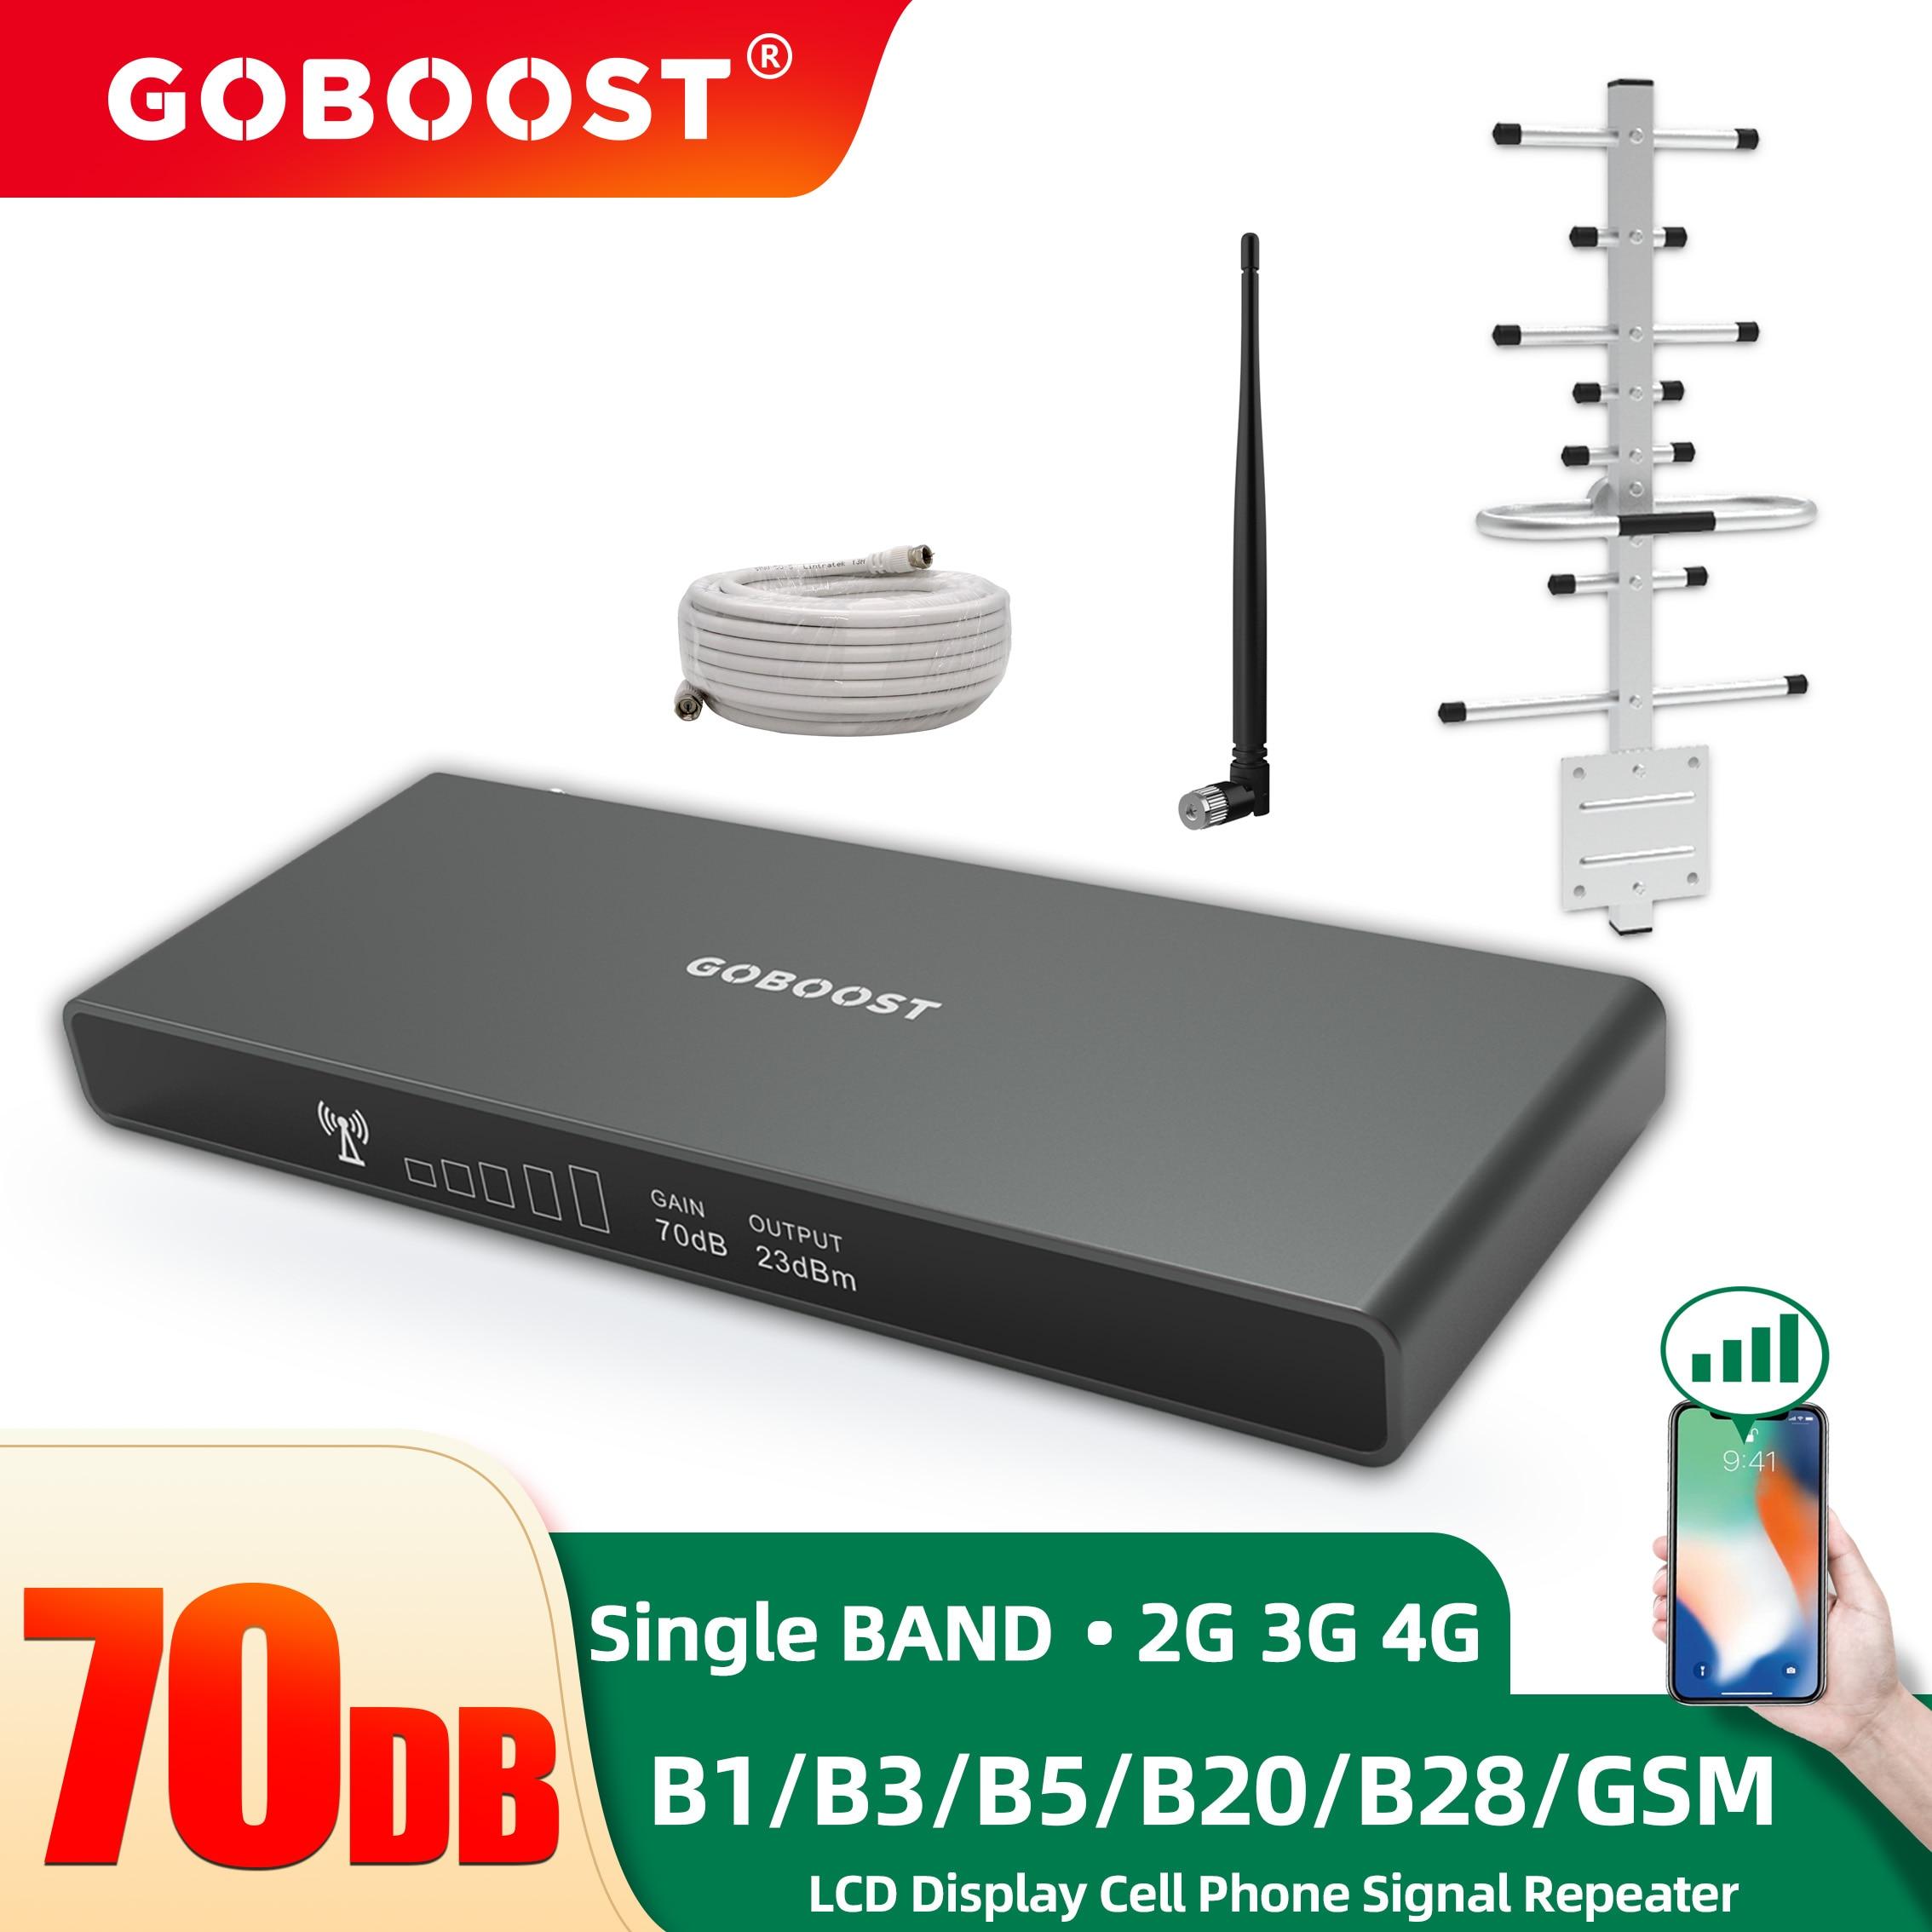 GOBOOST مكرر إشارة 4G الخلوية مكبر للصوت GSM 850 LTE 700 800 1800 Mhz شبكة موبايل الداعم 2G 3G هاتف محمول هوائي مجموعة